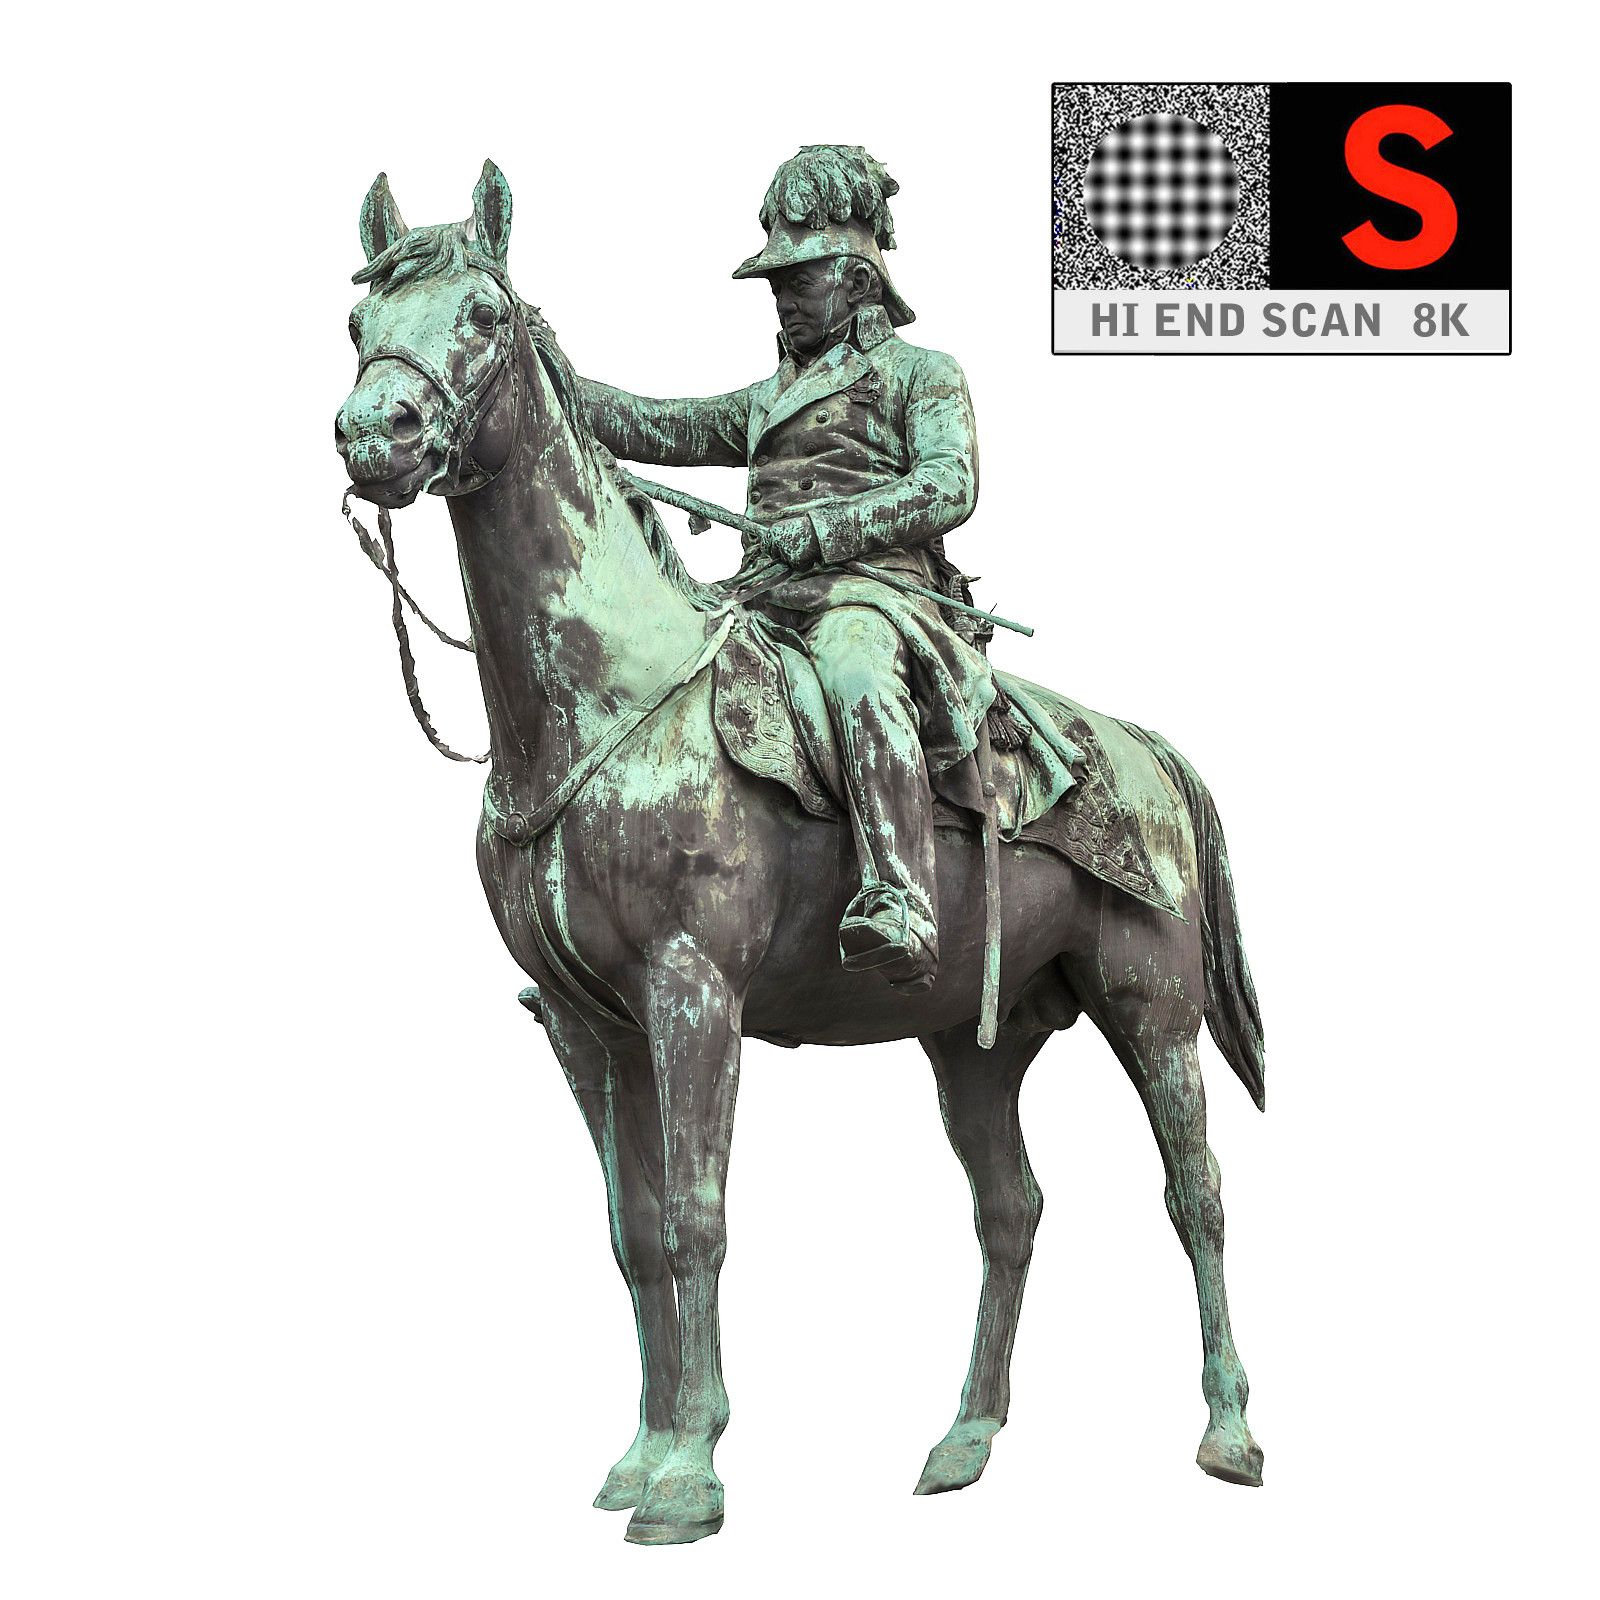 statue horse hd 3d model Statue, Angel statues, Horses